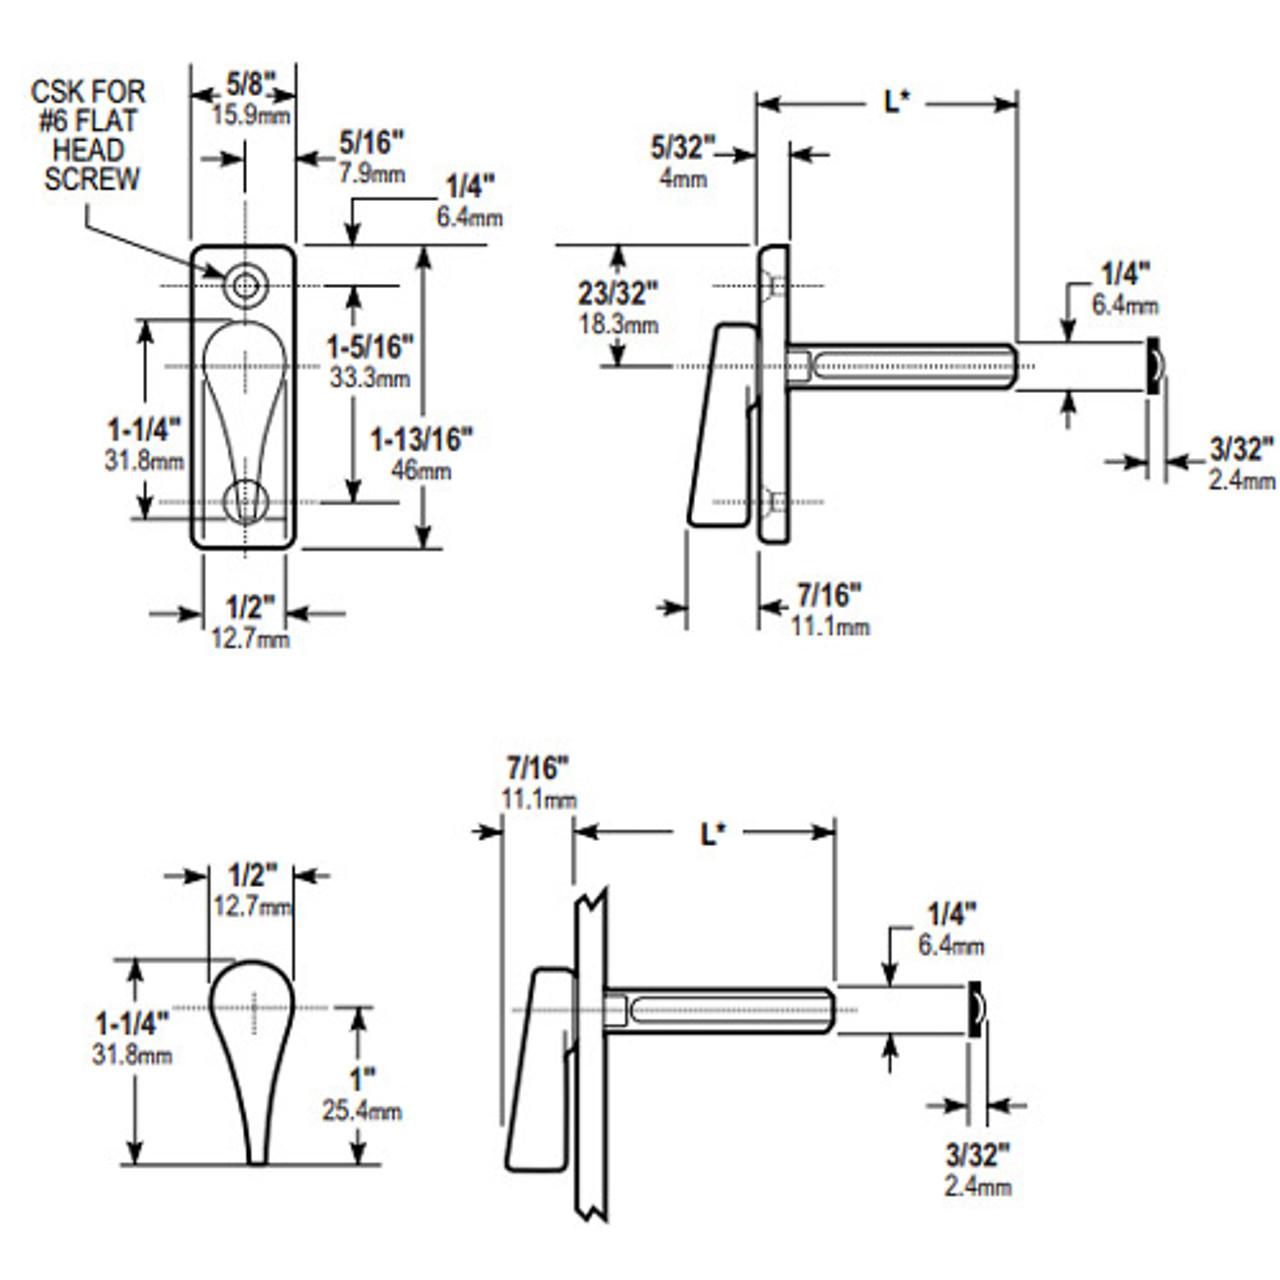 1000-02-24-119 Adams Rite 1000 Series Turns Dimensional View